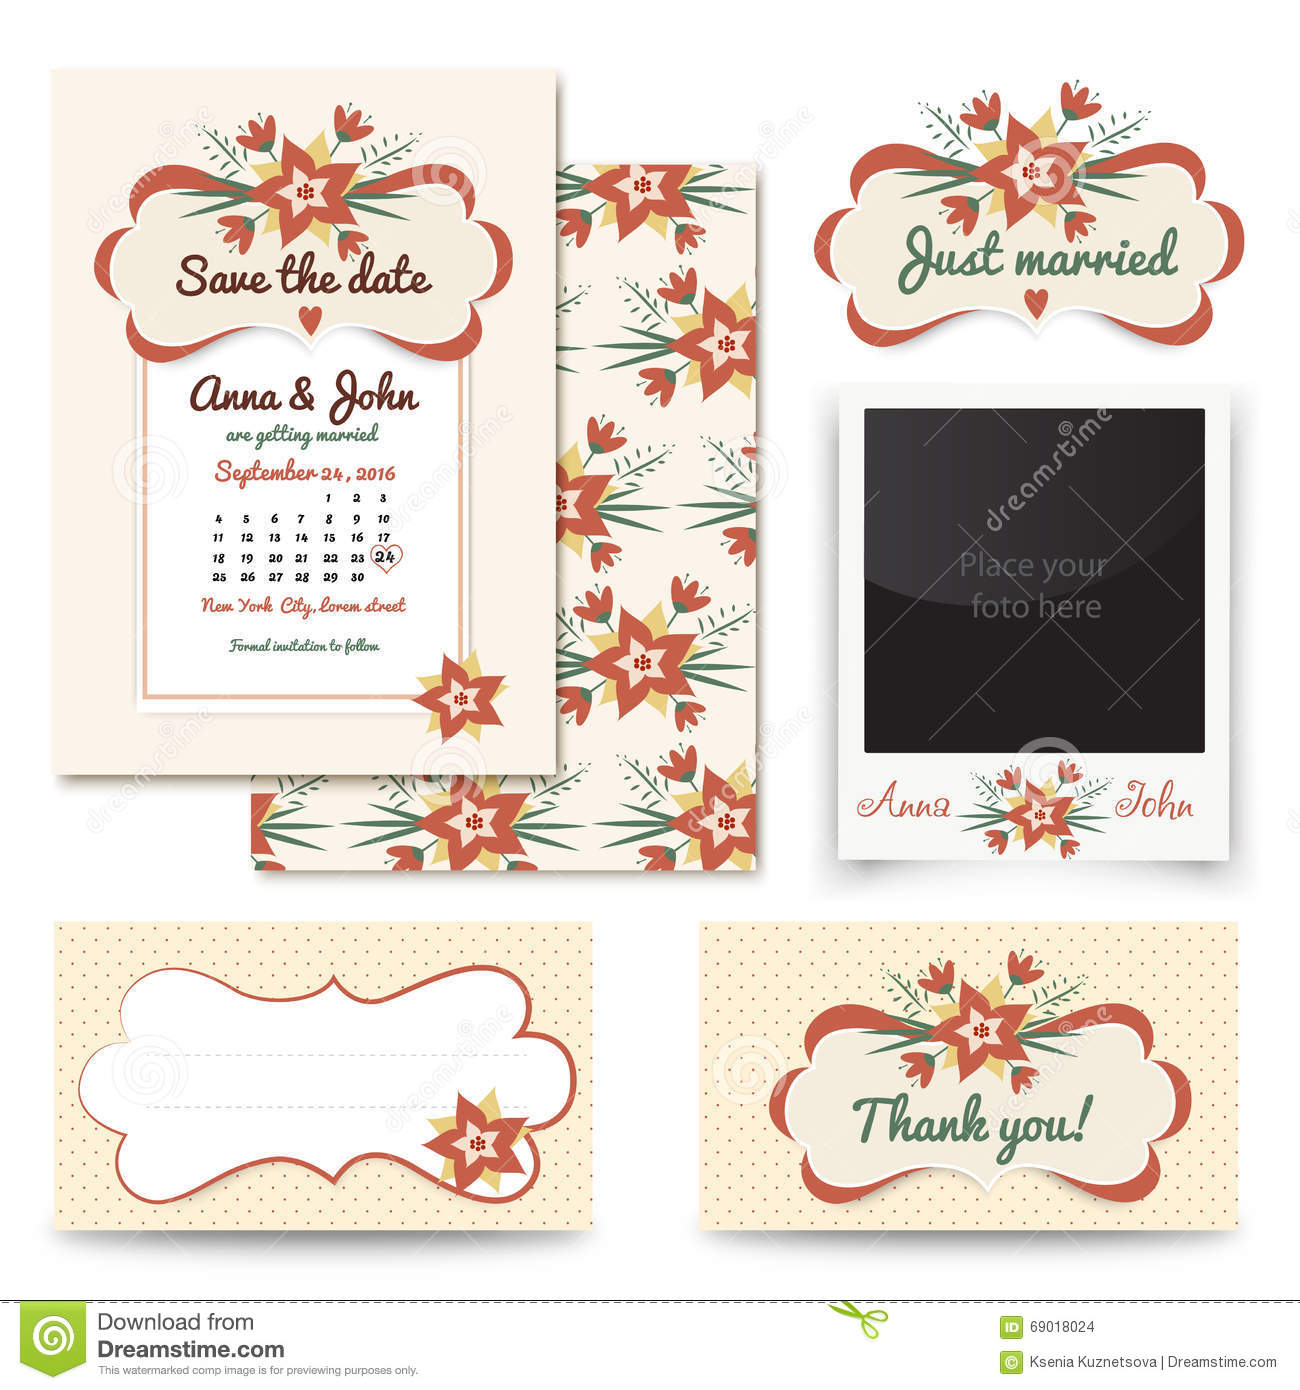 Vintage Wedding Invitation Design Sets Include Invitation Card.